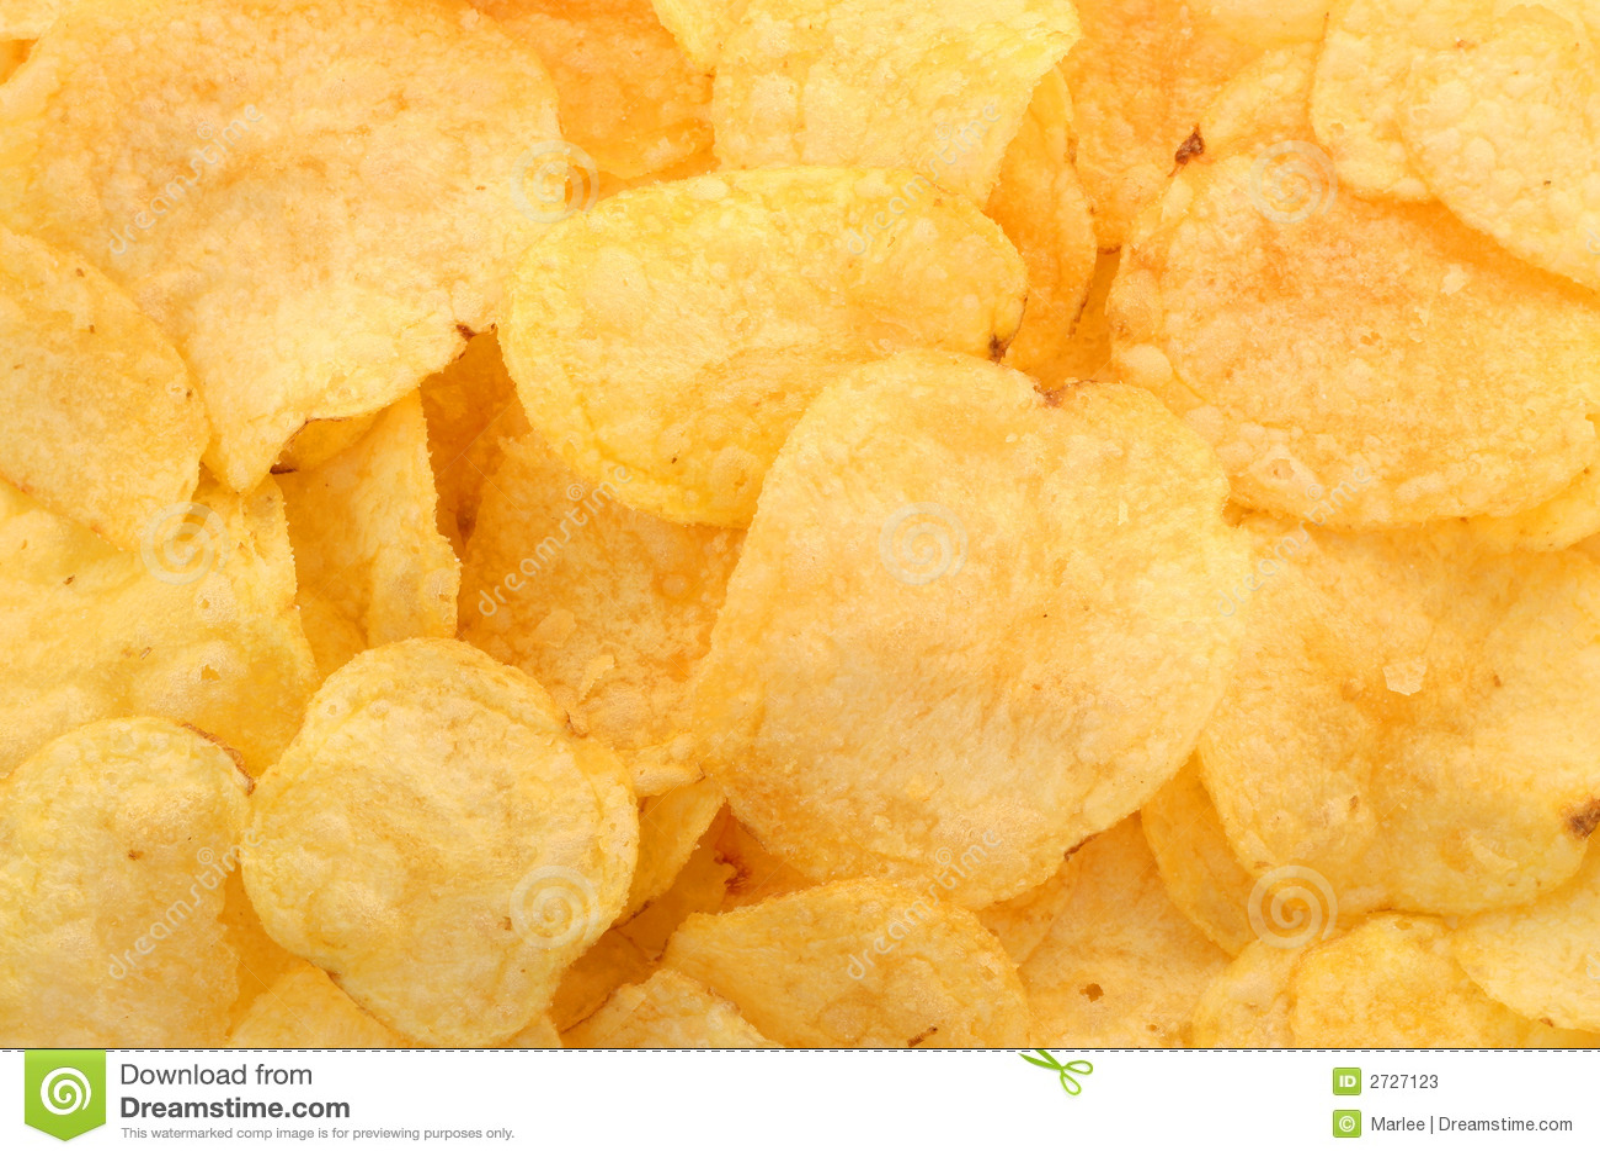 business plan on potato chips